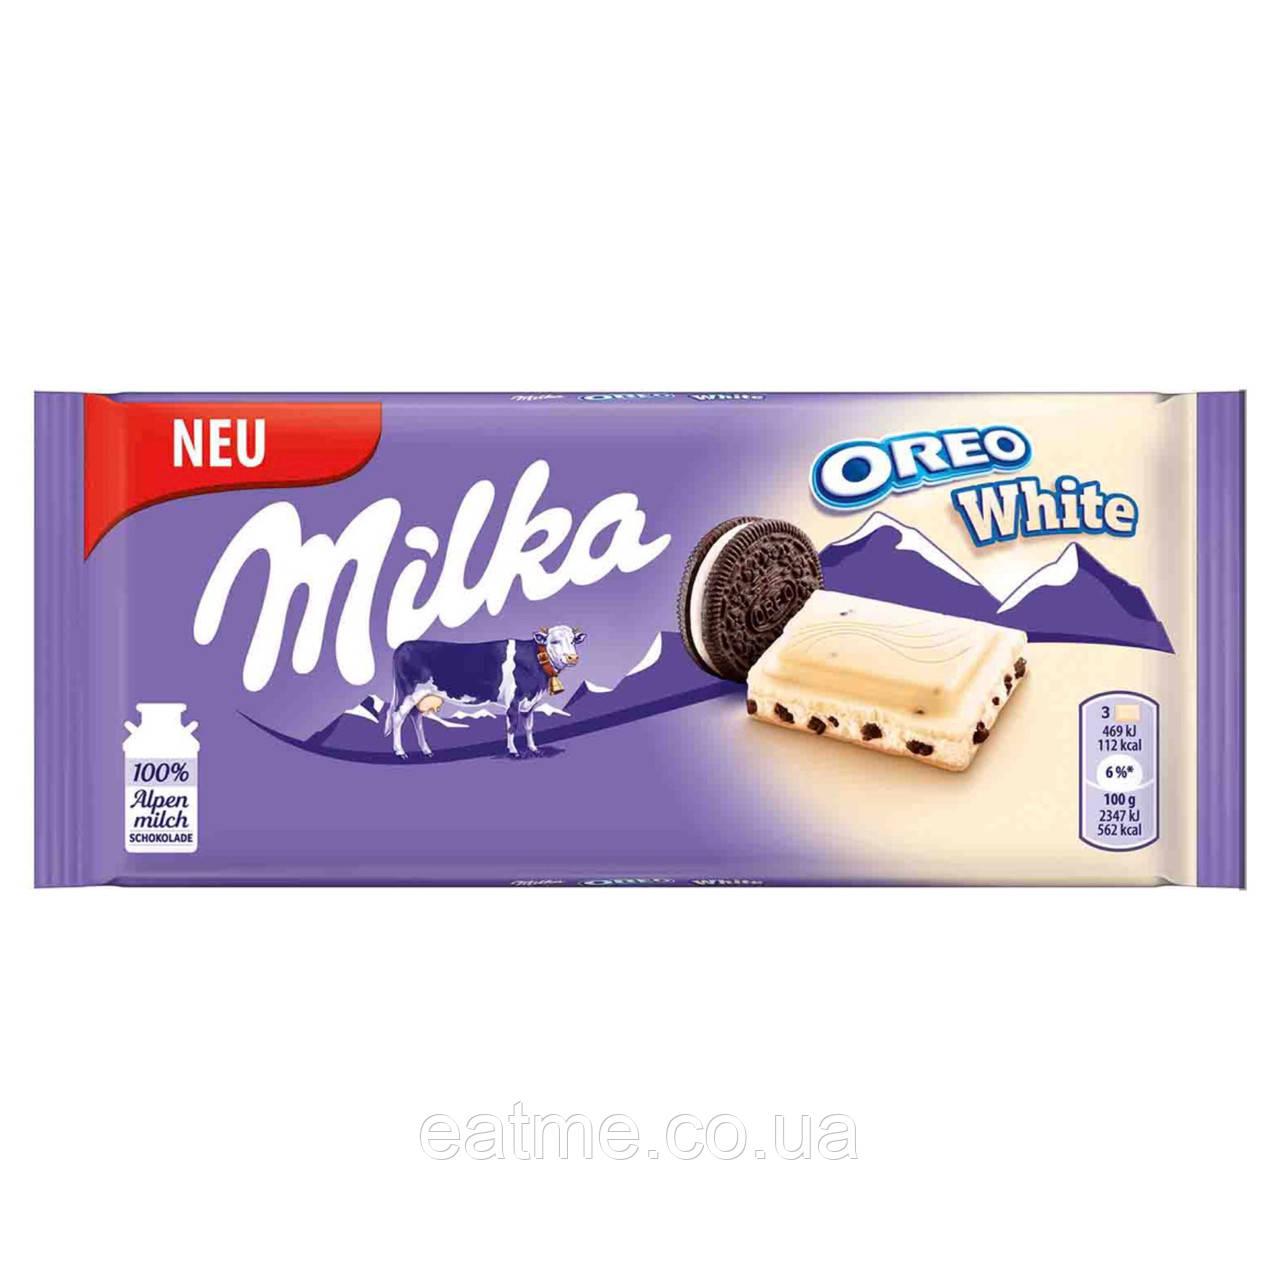 Milka Oreo White Белый шоколад со сливочной начинкой и печеньем Oreo